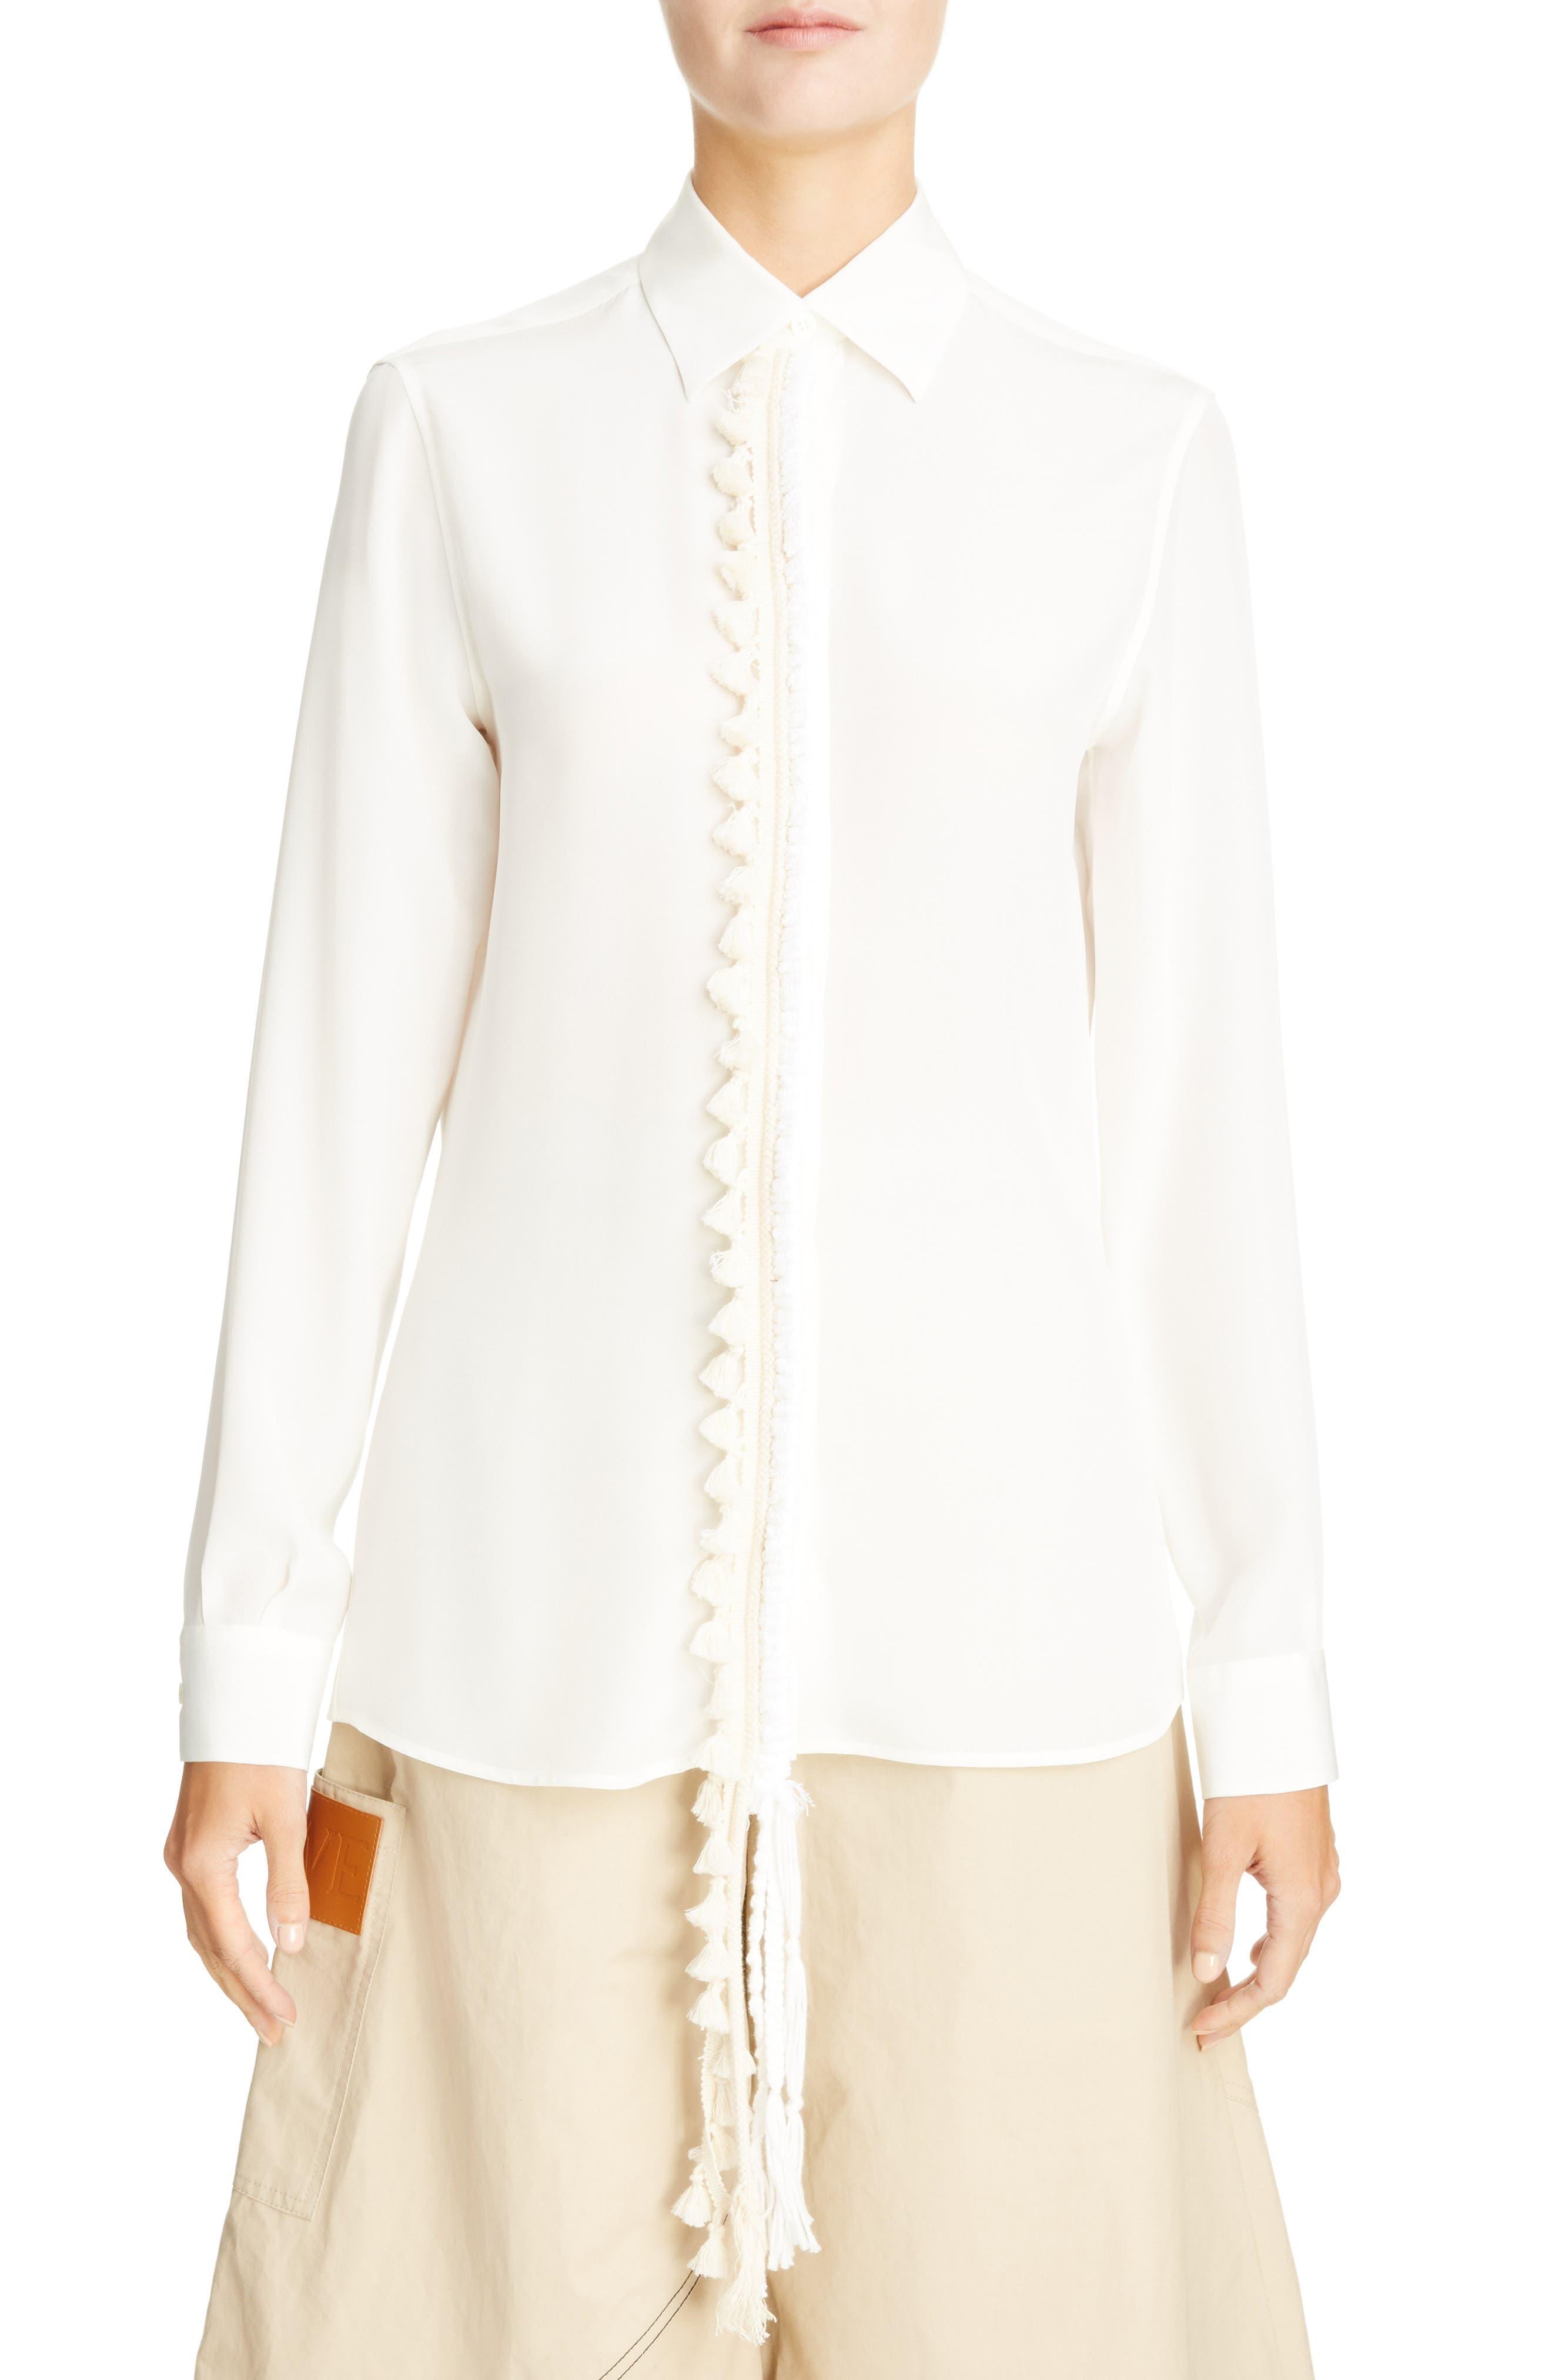 Loewe Tassel Placket Silk Shirt